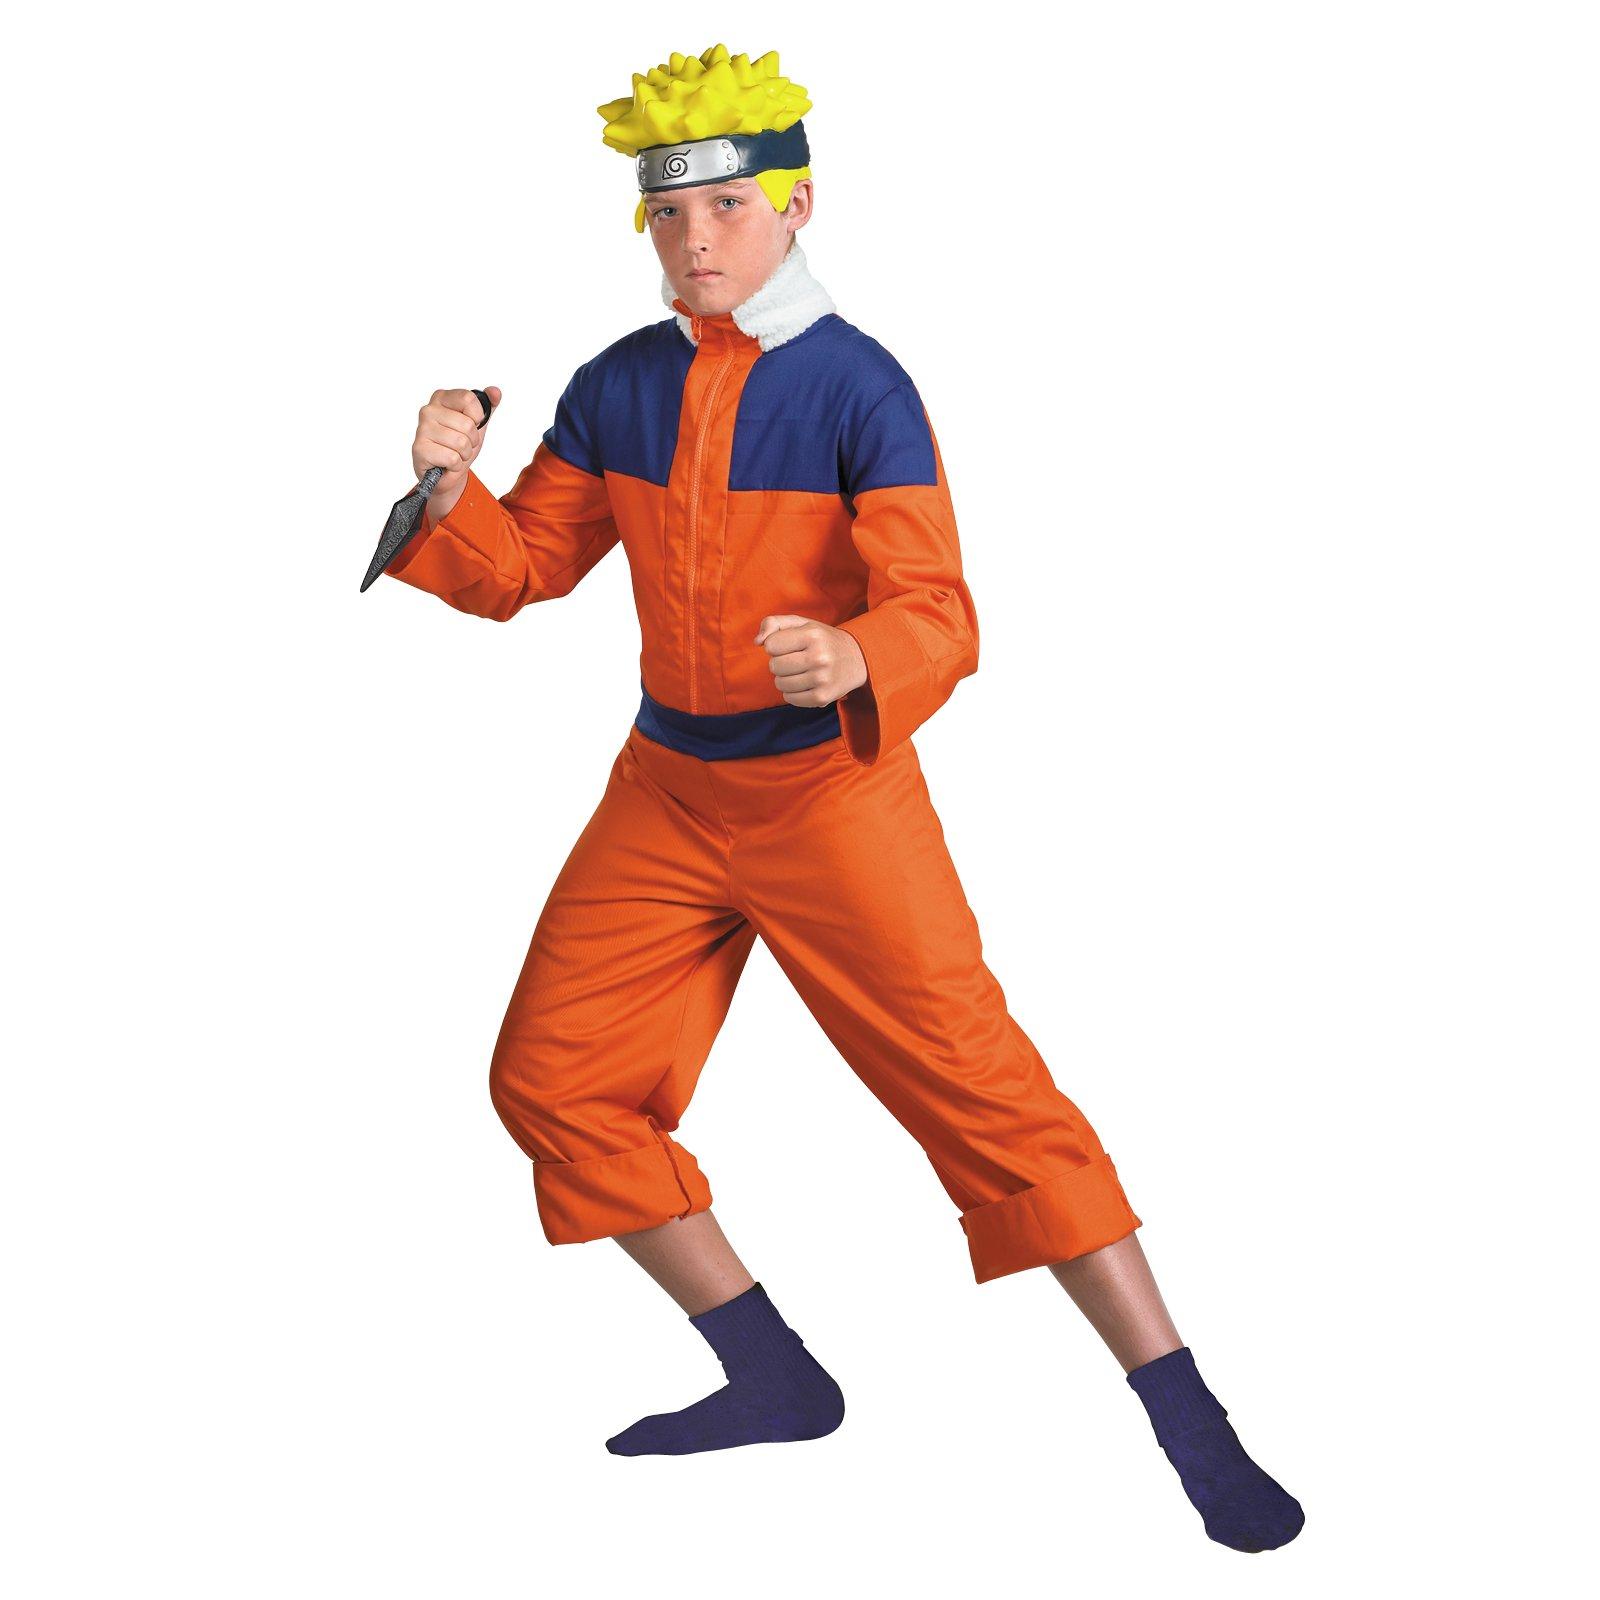 Naruto And Bleach Anime Wallpapers: Naruto cosplay costume